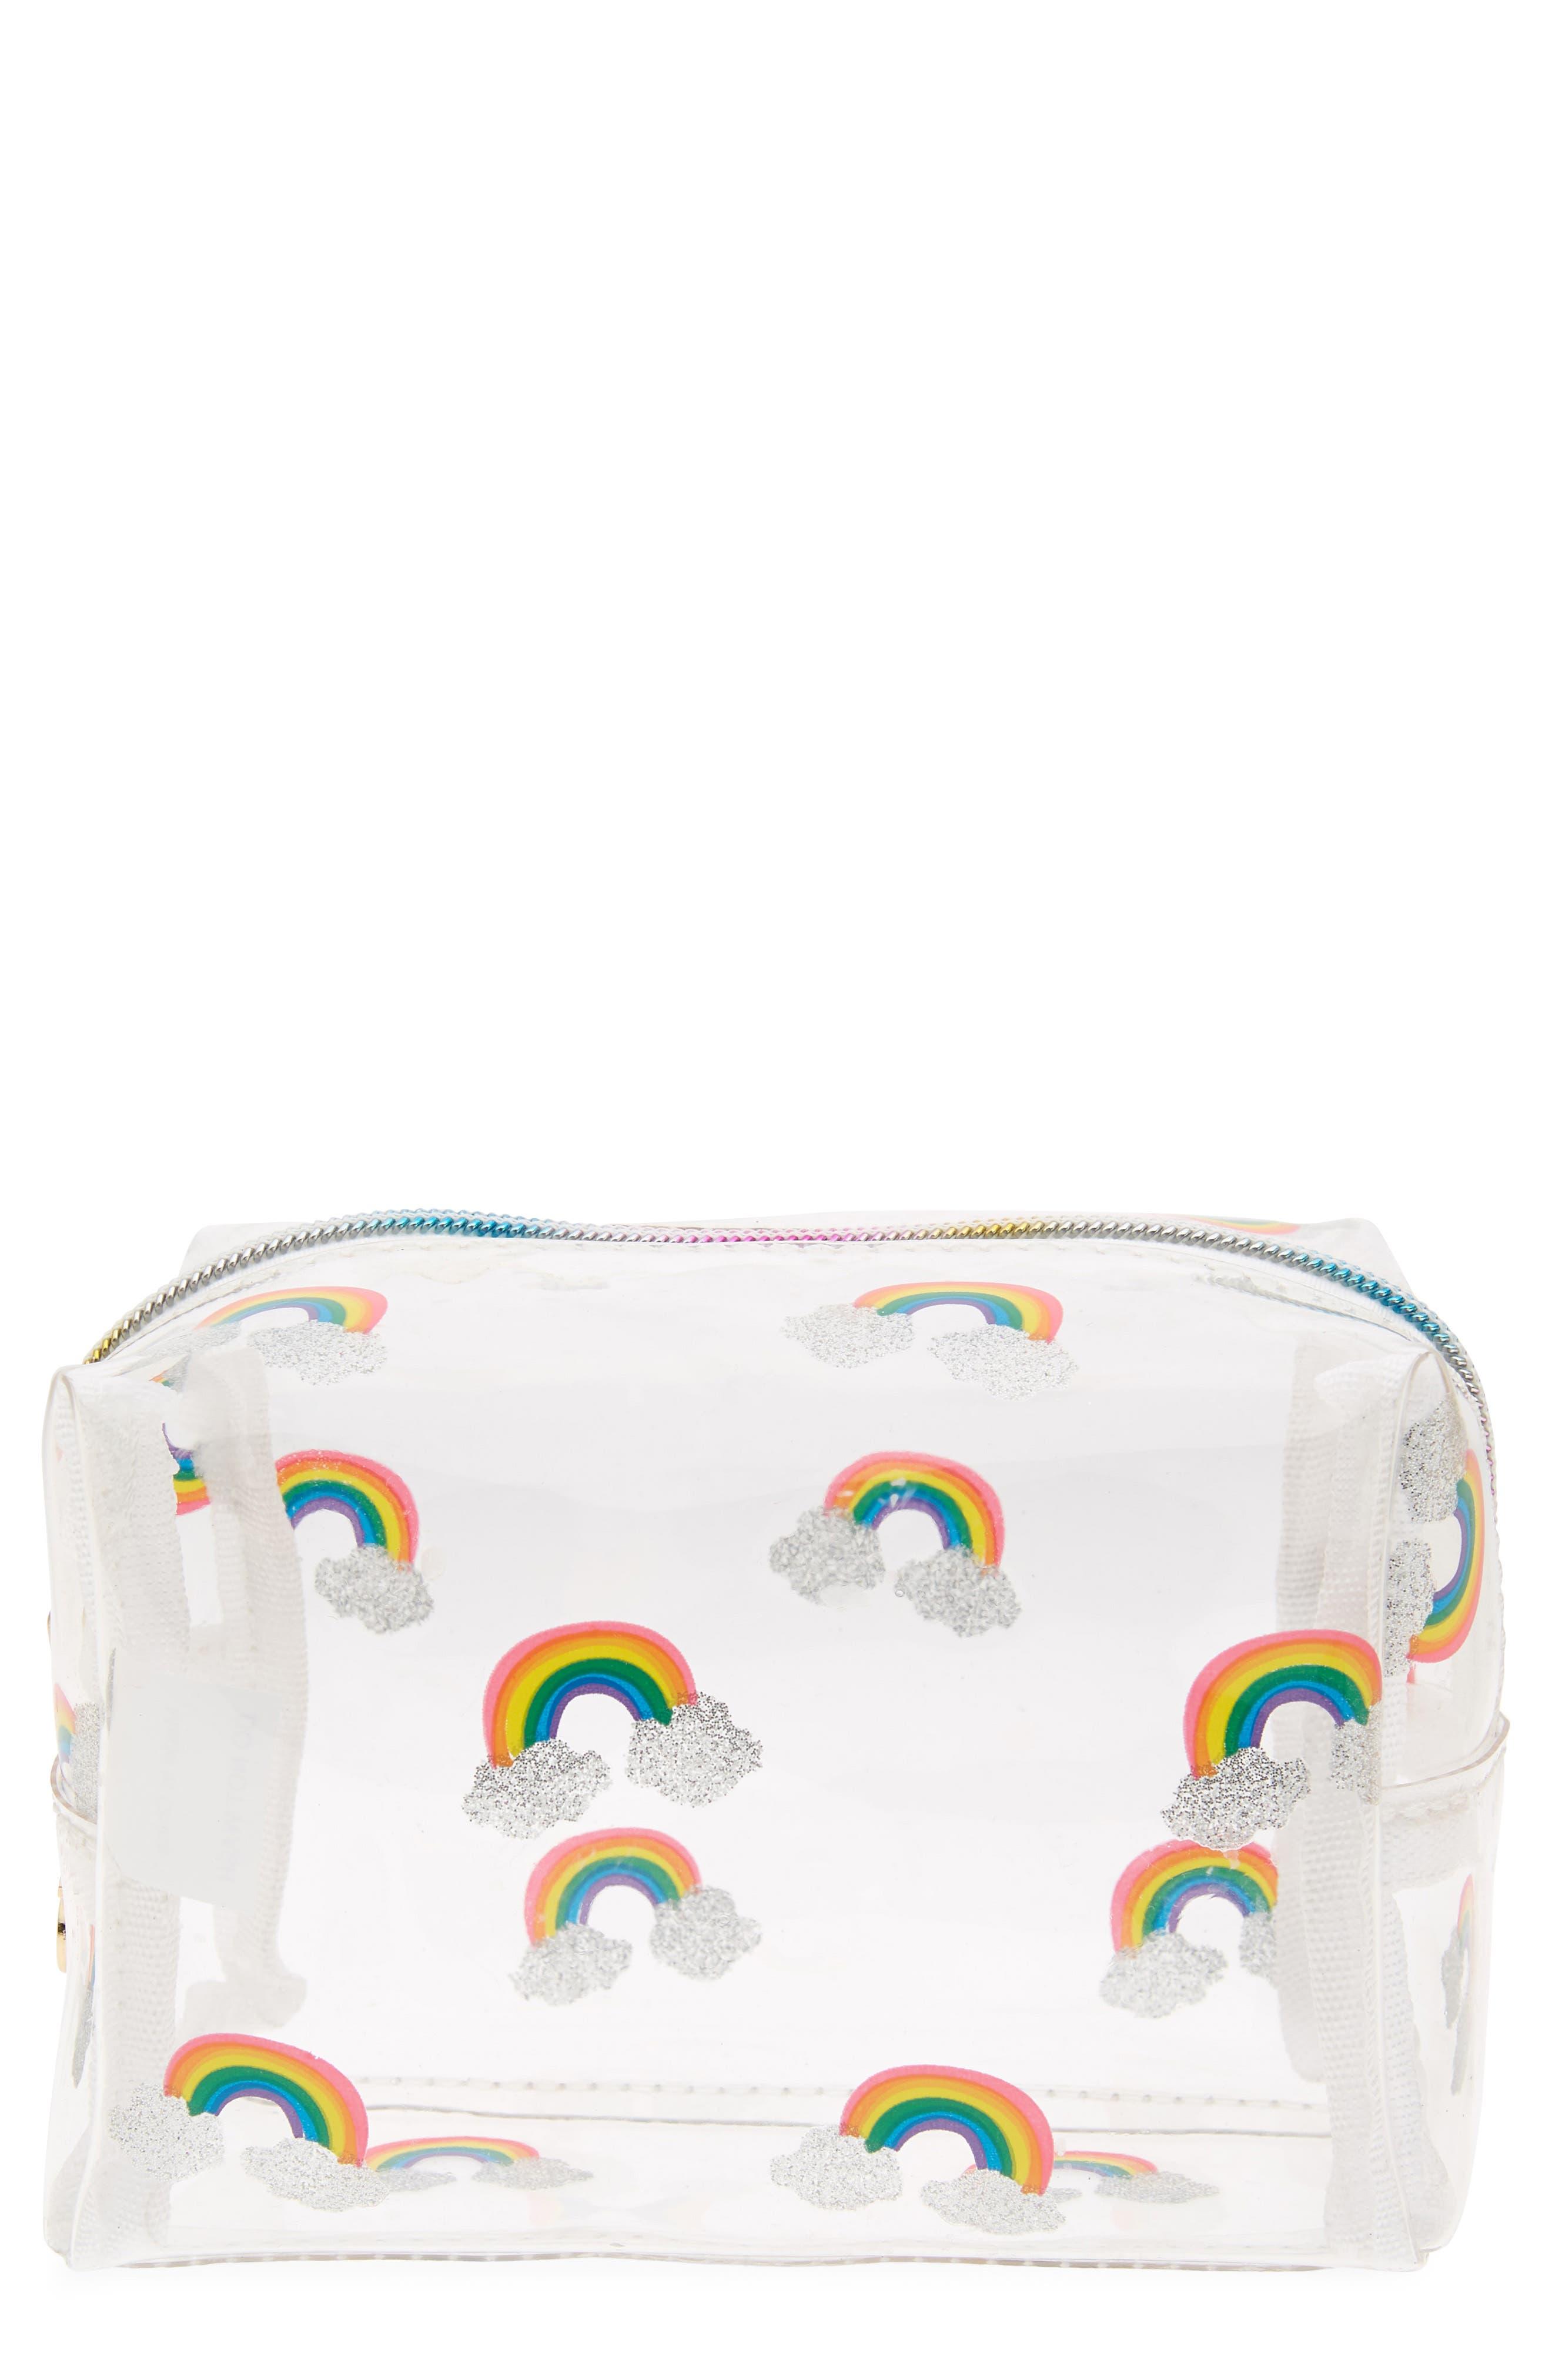 Rainbow Cosmetics Bag,                             Main thumbnail 1, color,                             Multi